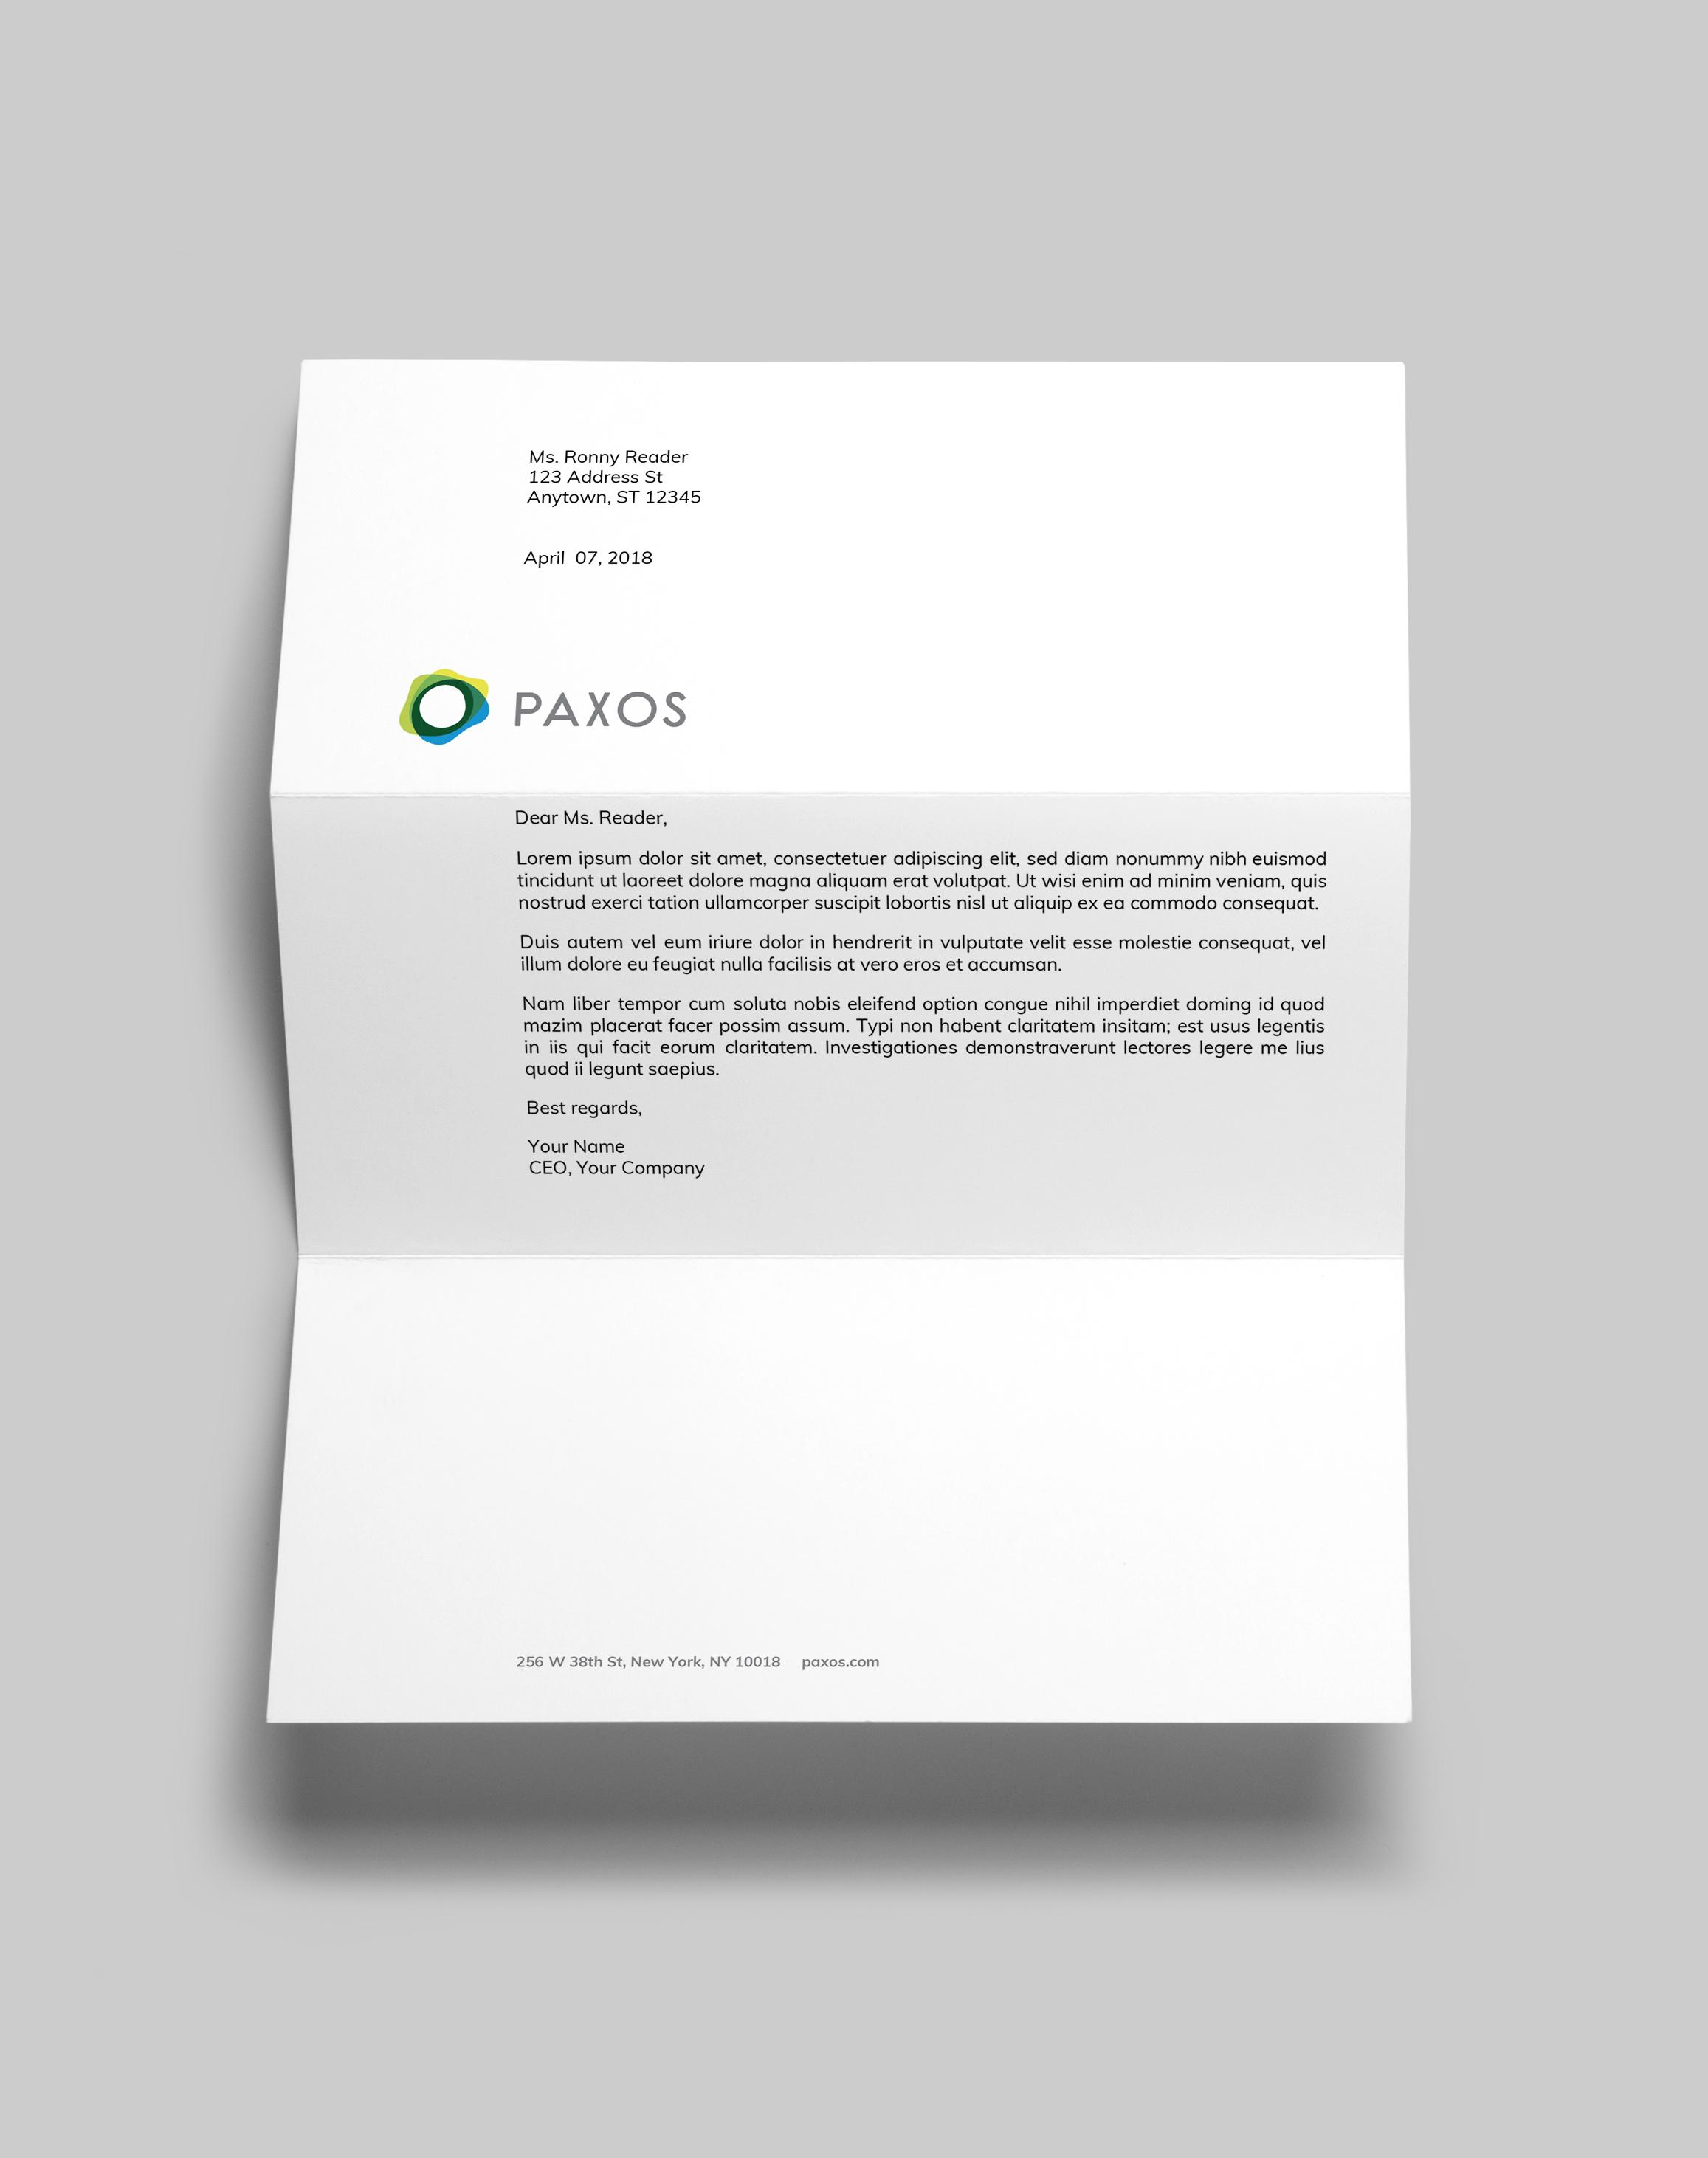 Paxos letter head.jpg